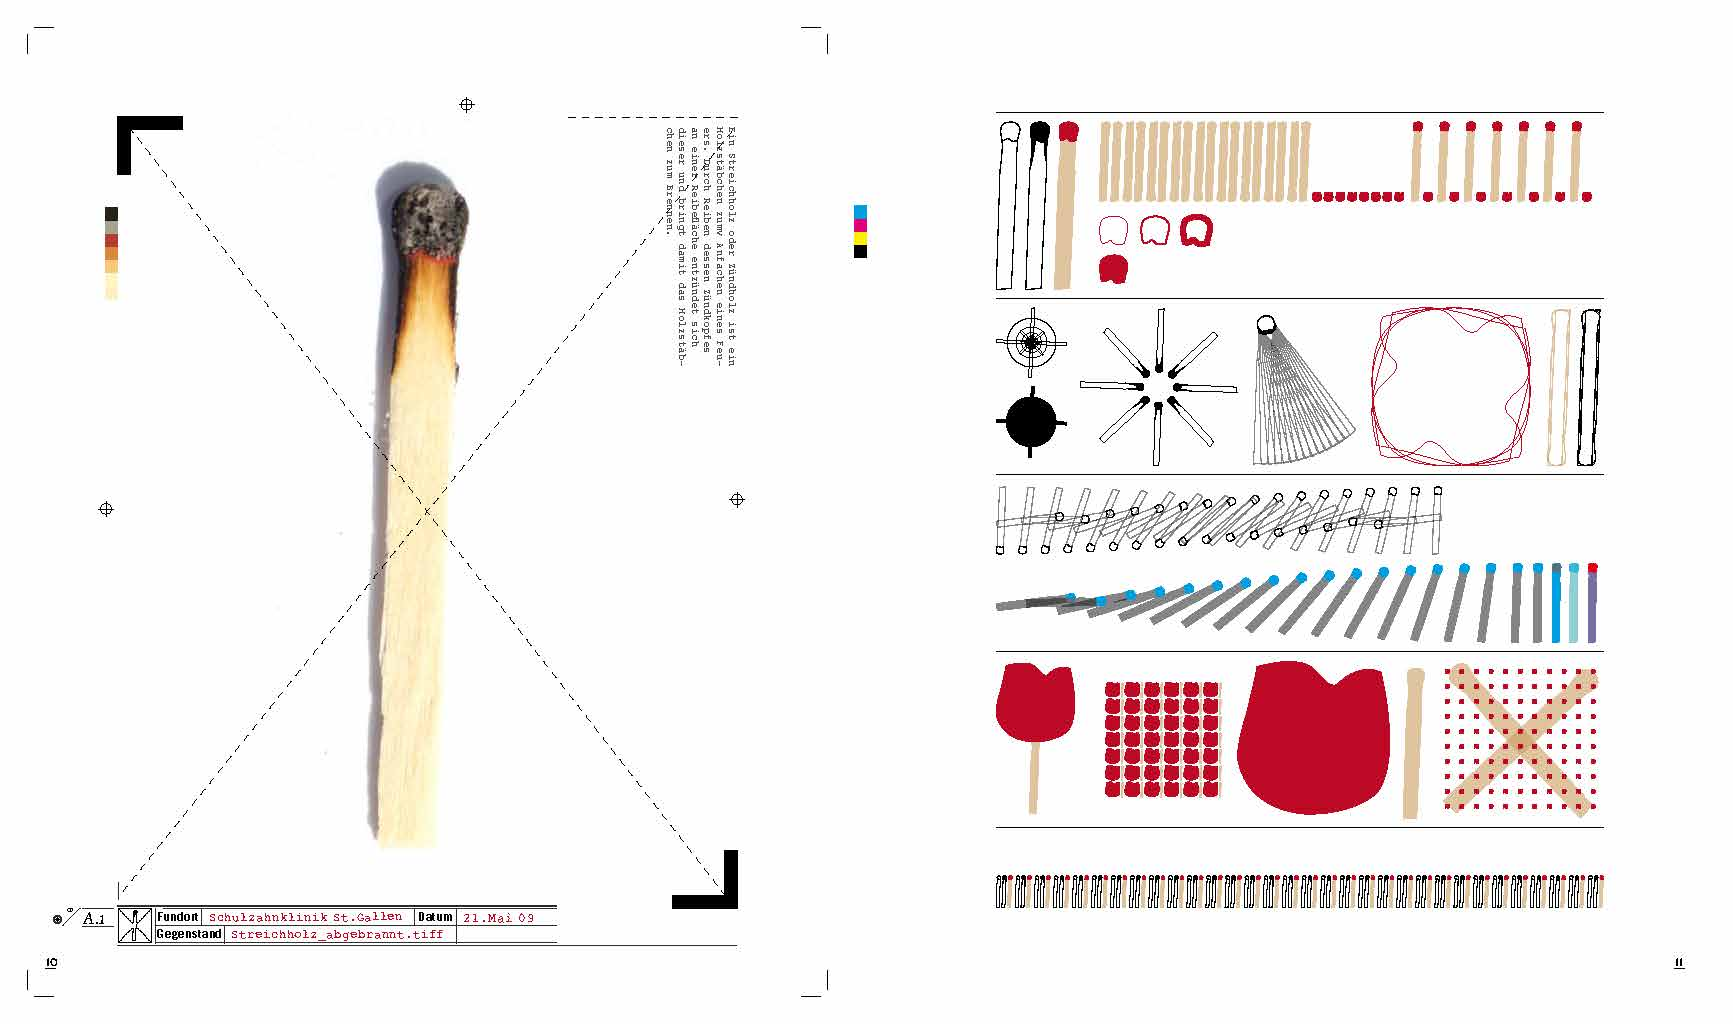 visual_recycling_druckboegen_Seite_006